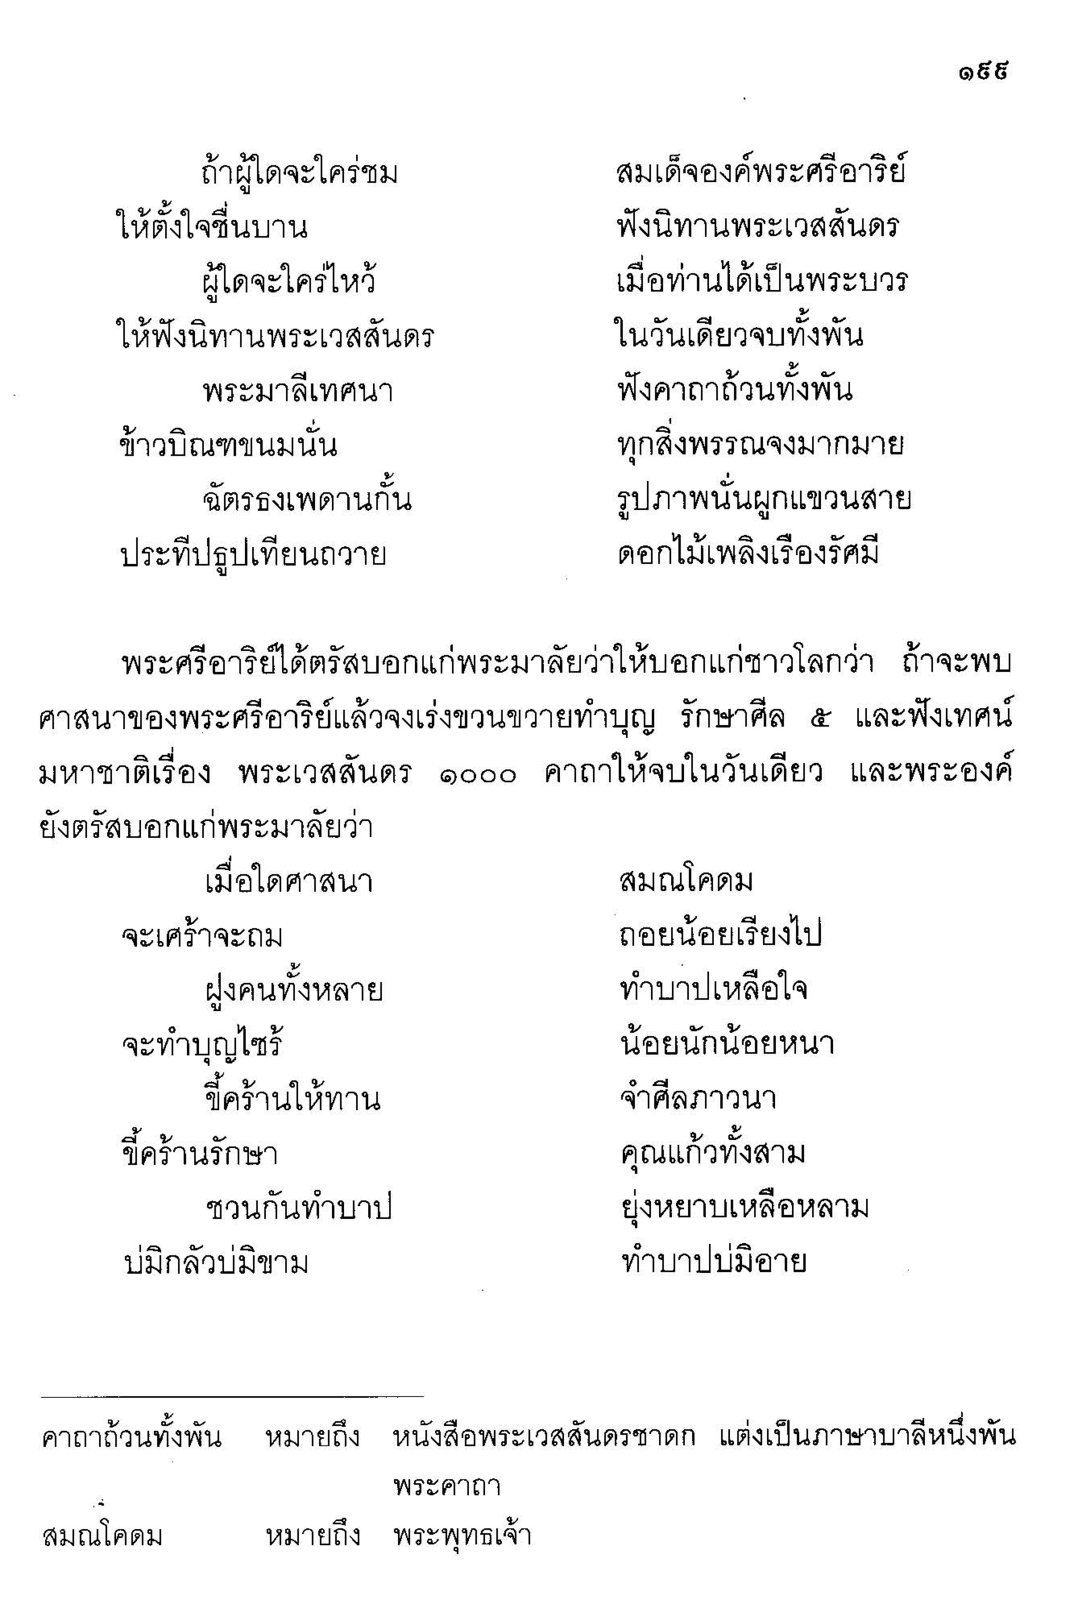 ebook_thai_sect_2_65-990_Page_207.jpg